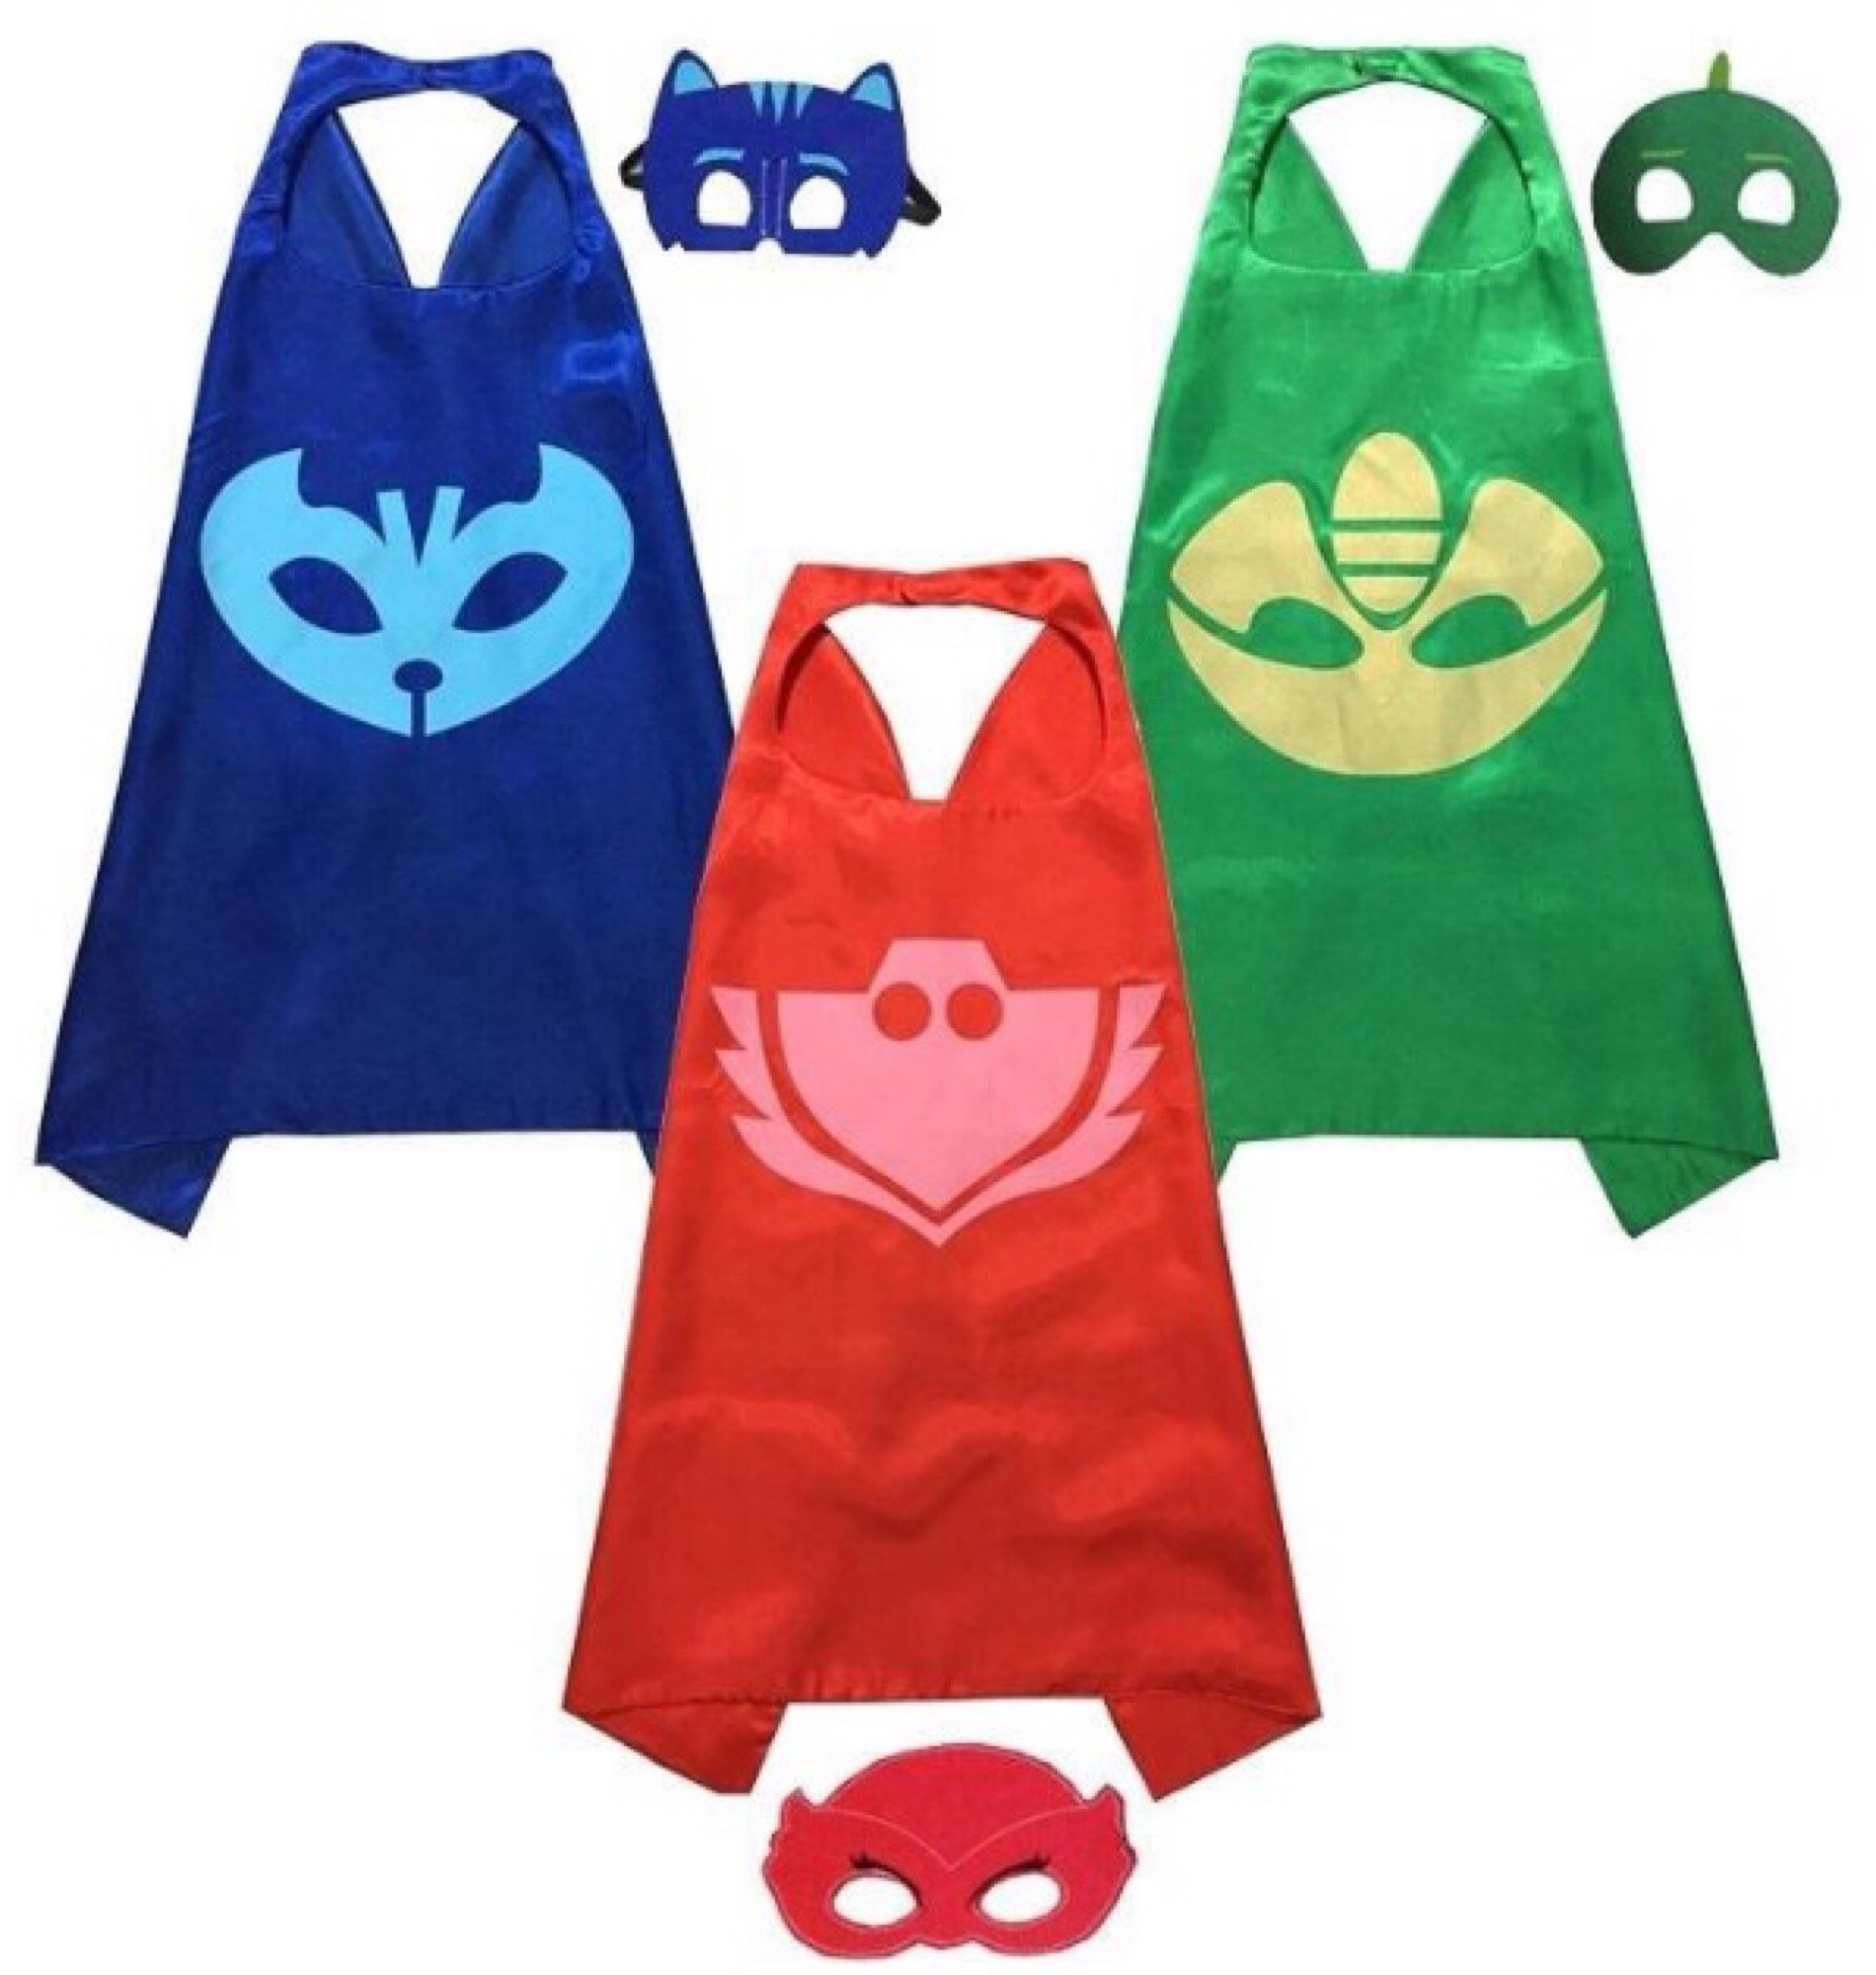 Koolkidz Pj Masks Costumes For Kids Catboy Owlette Gekko 3 Satin Capes And 3 .. 2